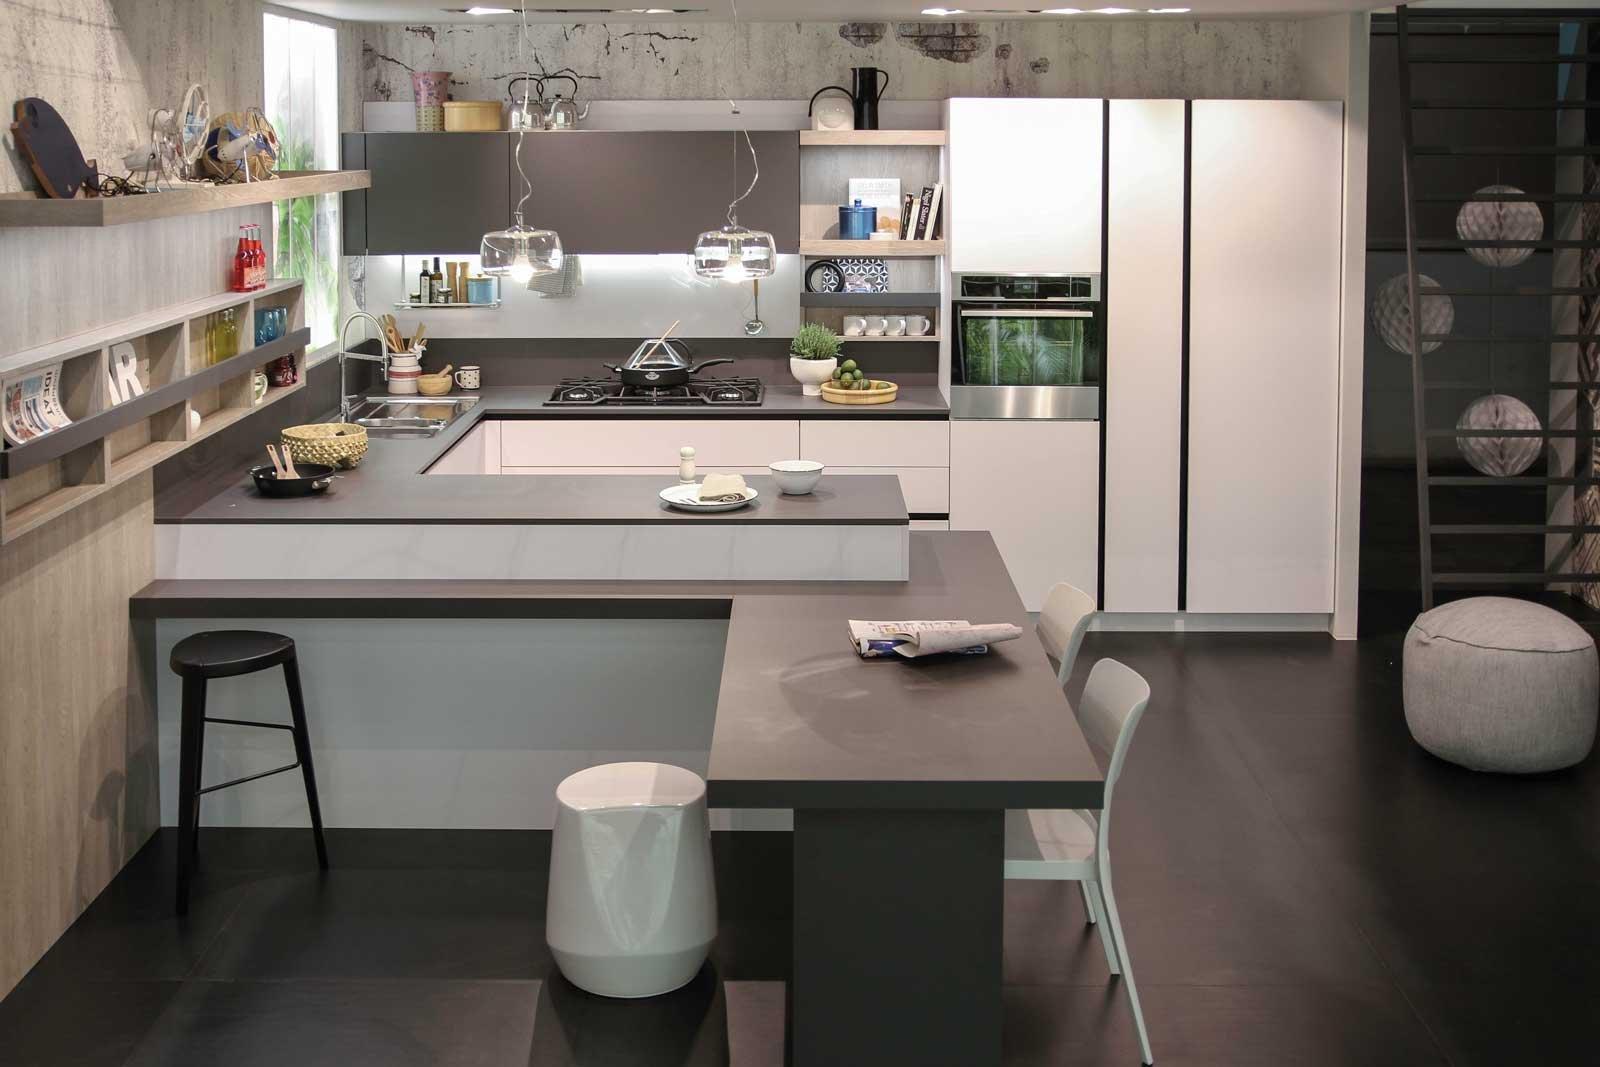 Cucine Moderne Snaidero Prezzi. Latest Cucine Snaidero With Cucine ...